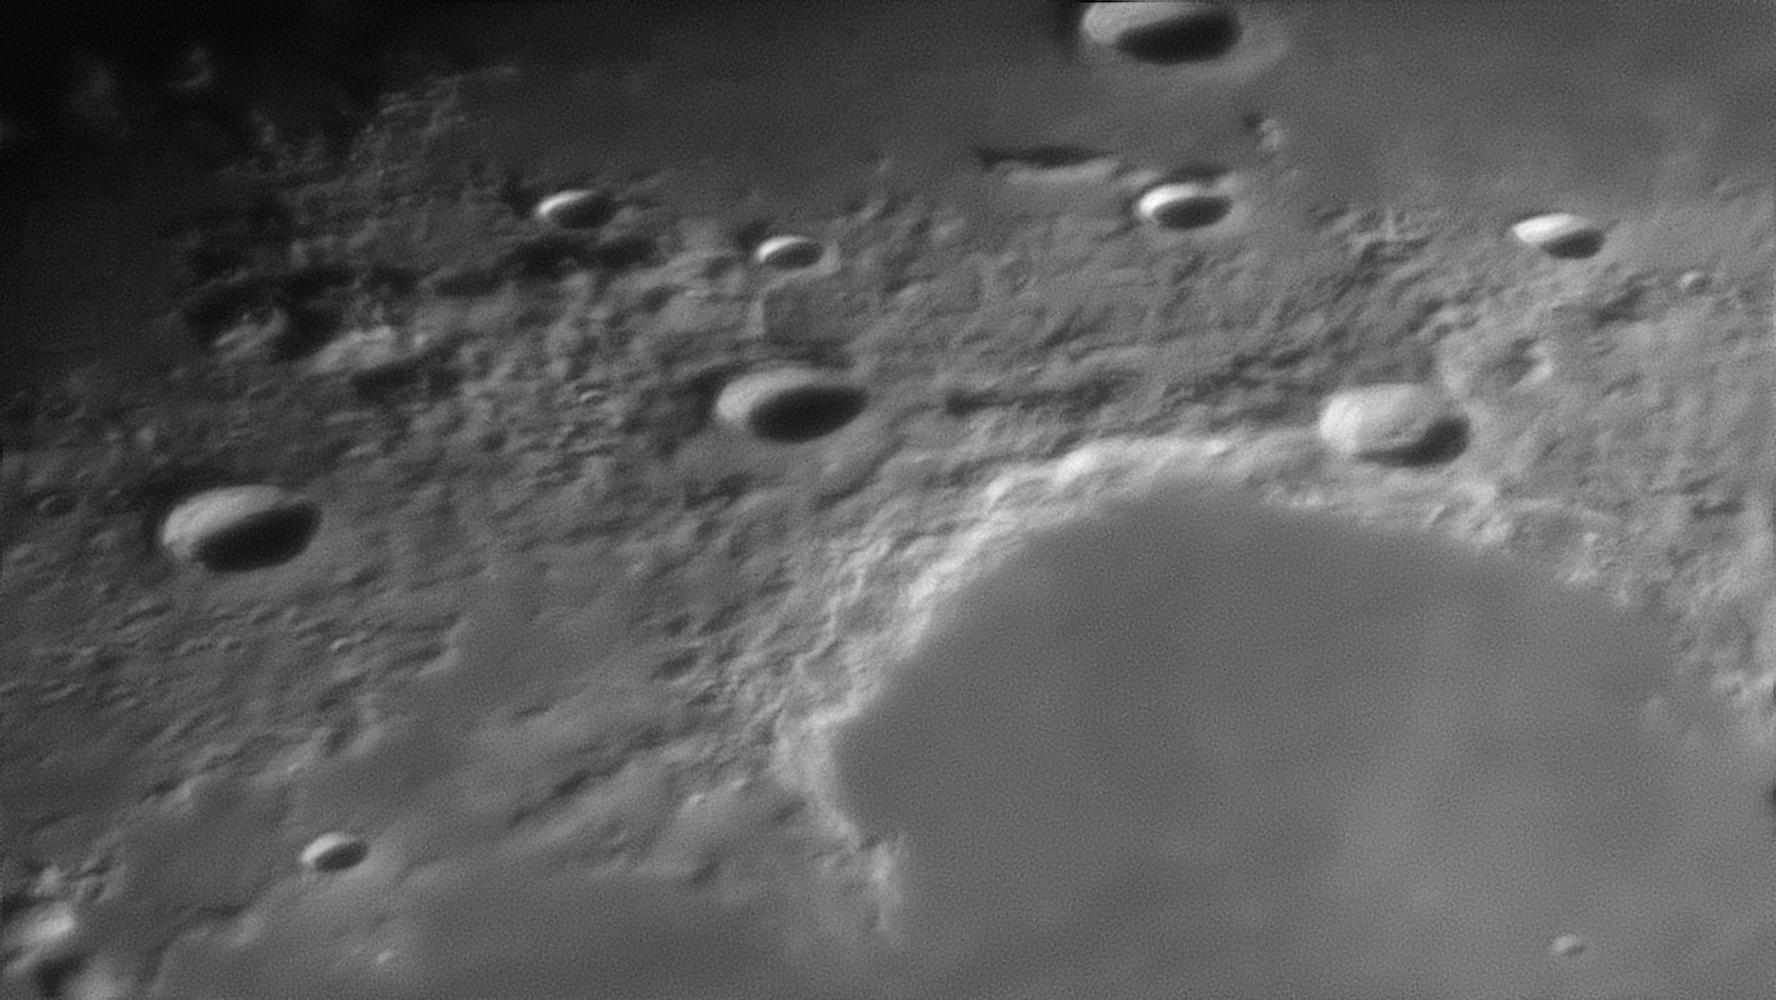 2021-02-23-2229_2-IR-Moon_lapl5_ap641_AS_mer_iris.png.69d253b6dc7c6fa8aed7c6cb62361114.png